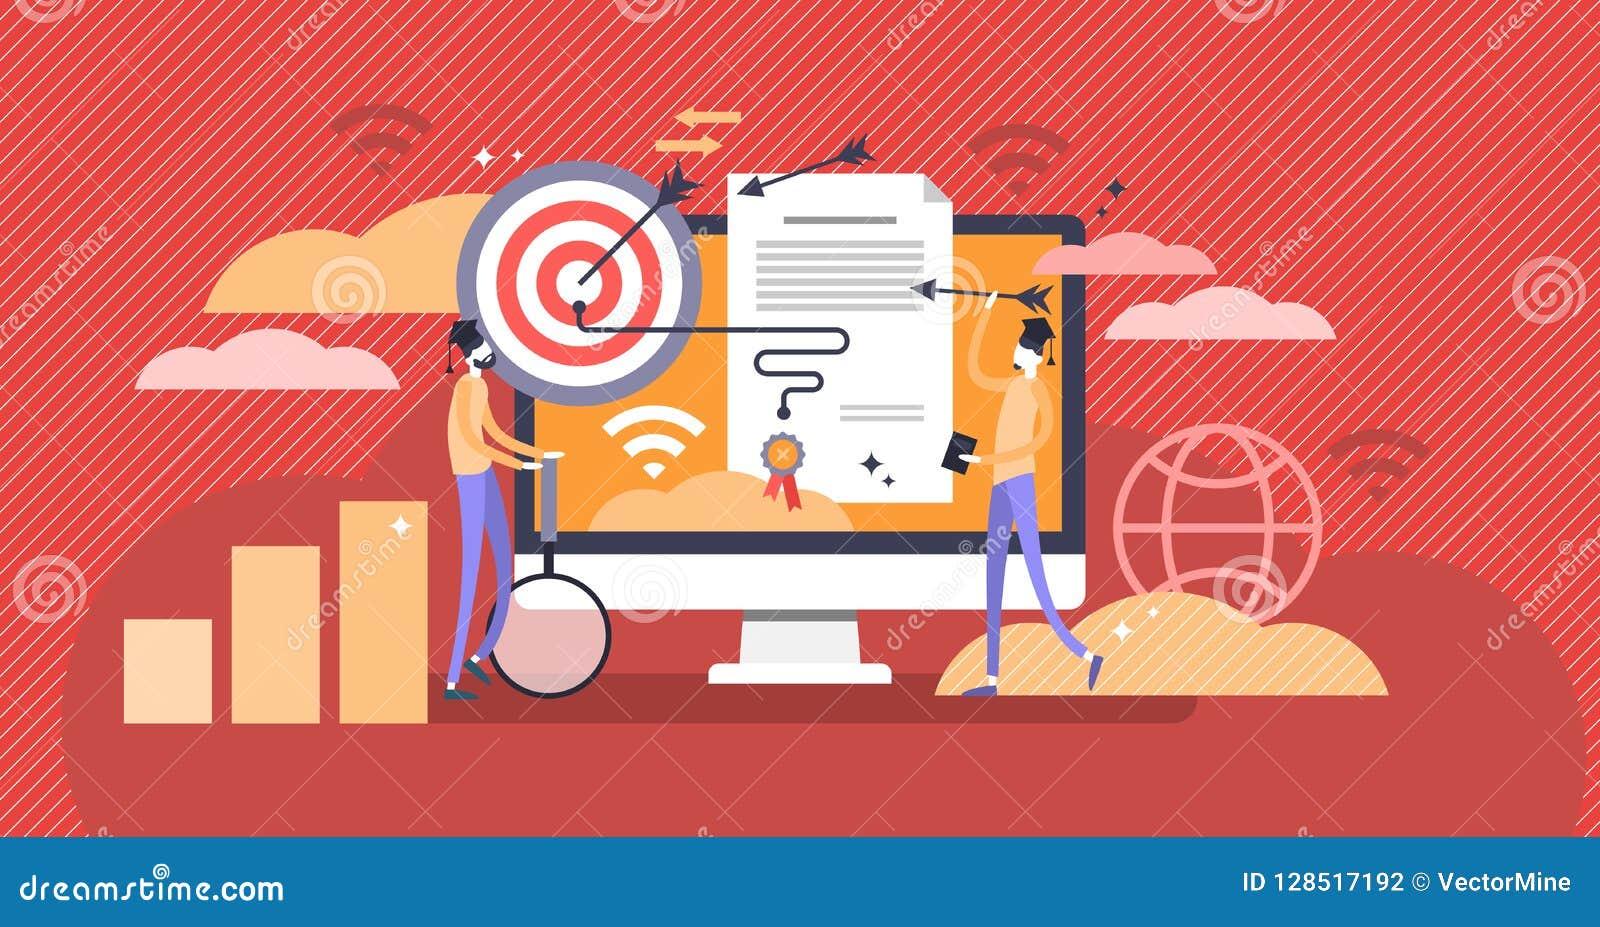 Marketing-Diplom und on-line-Lernkonzeptvektorillustration